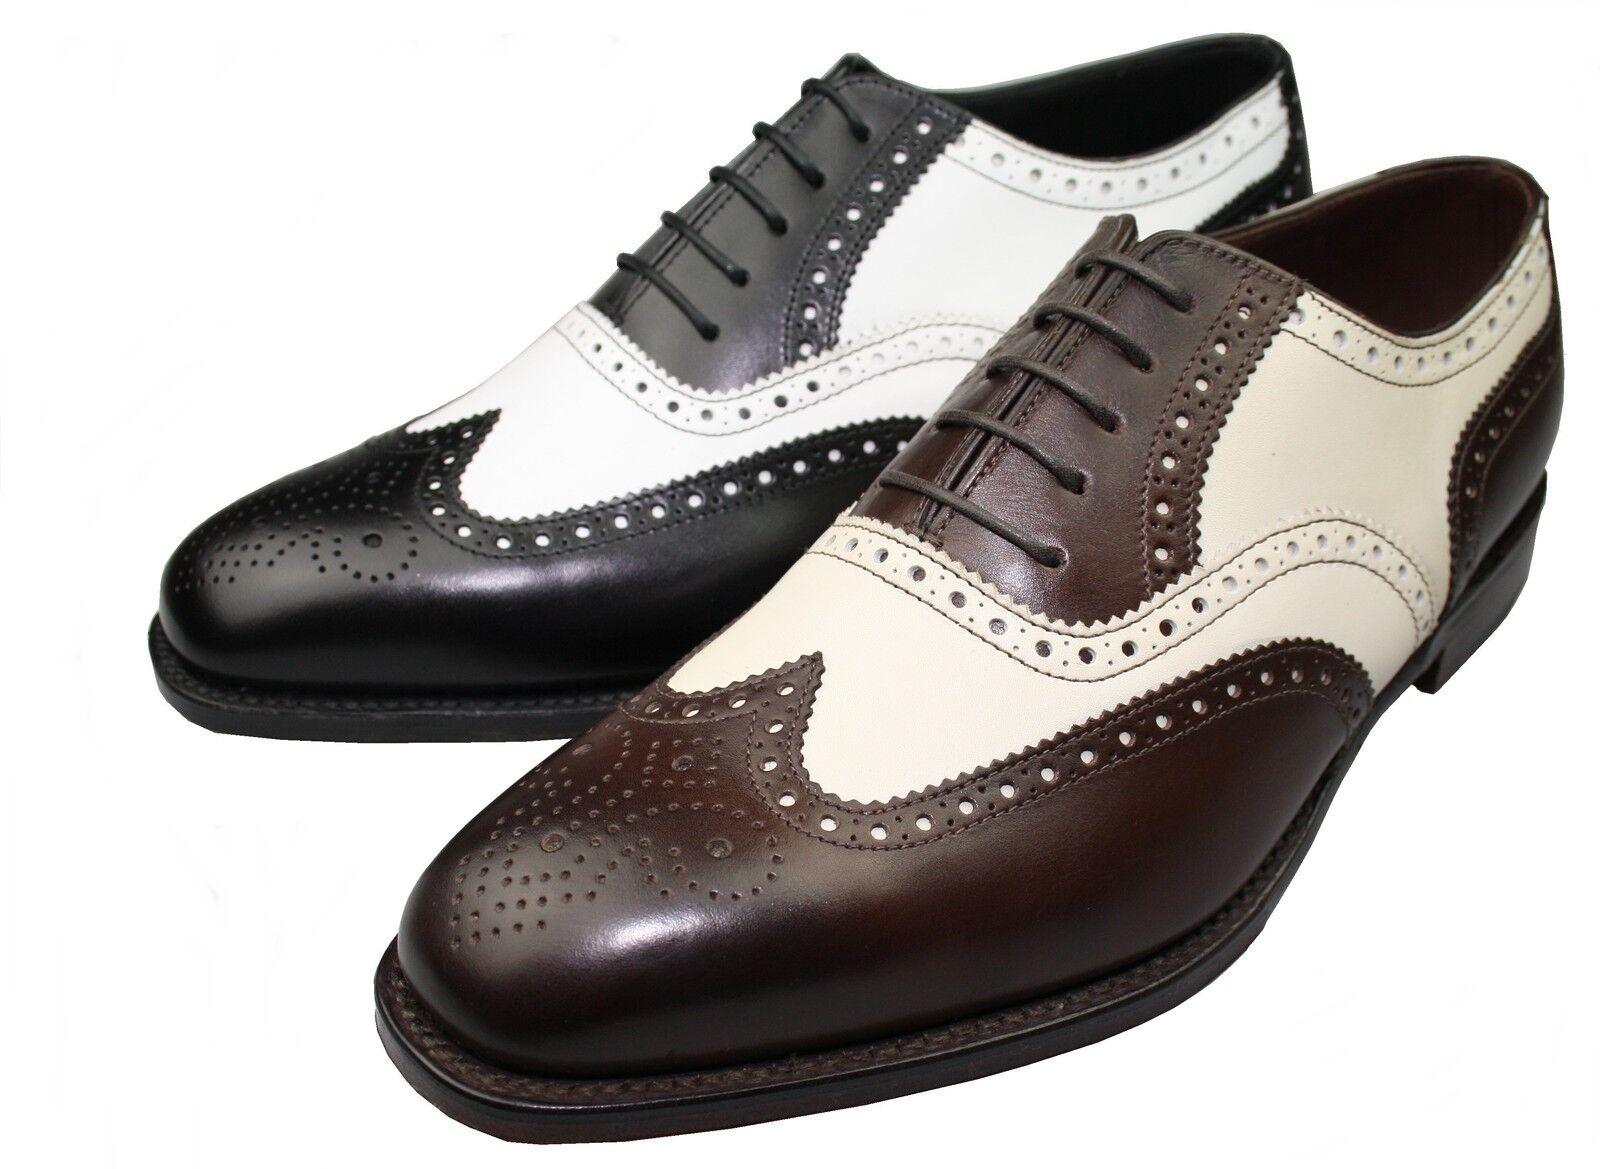 Loake rahmengenähte Schuhe 1880 1880 1880 Sloane Spectator Brogue Qualität made in England 536bb2